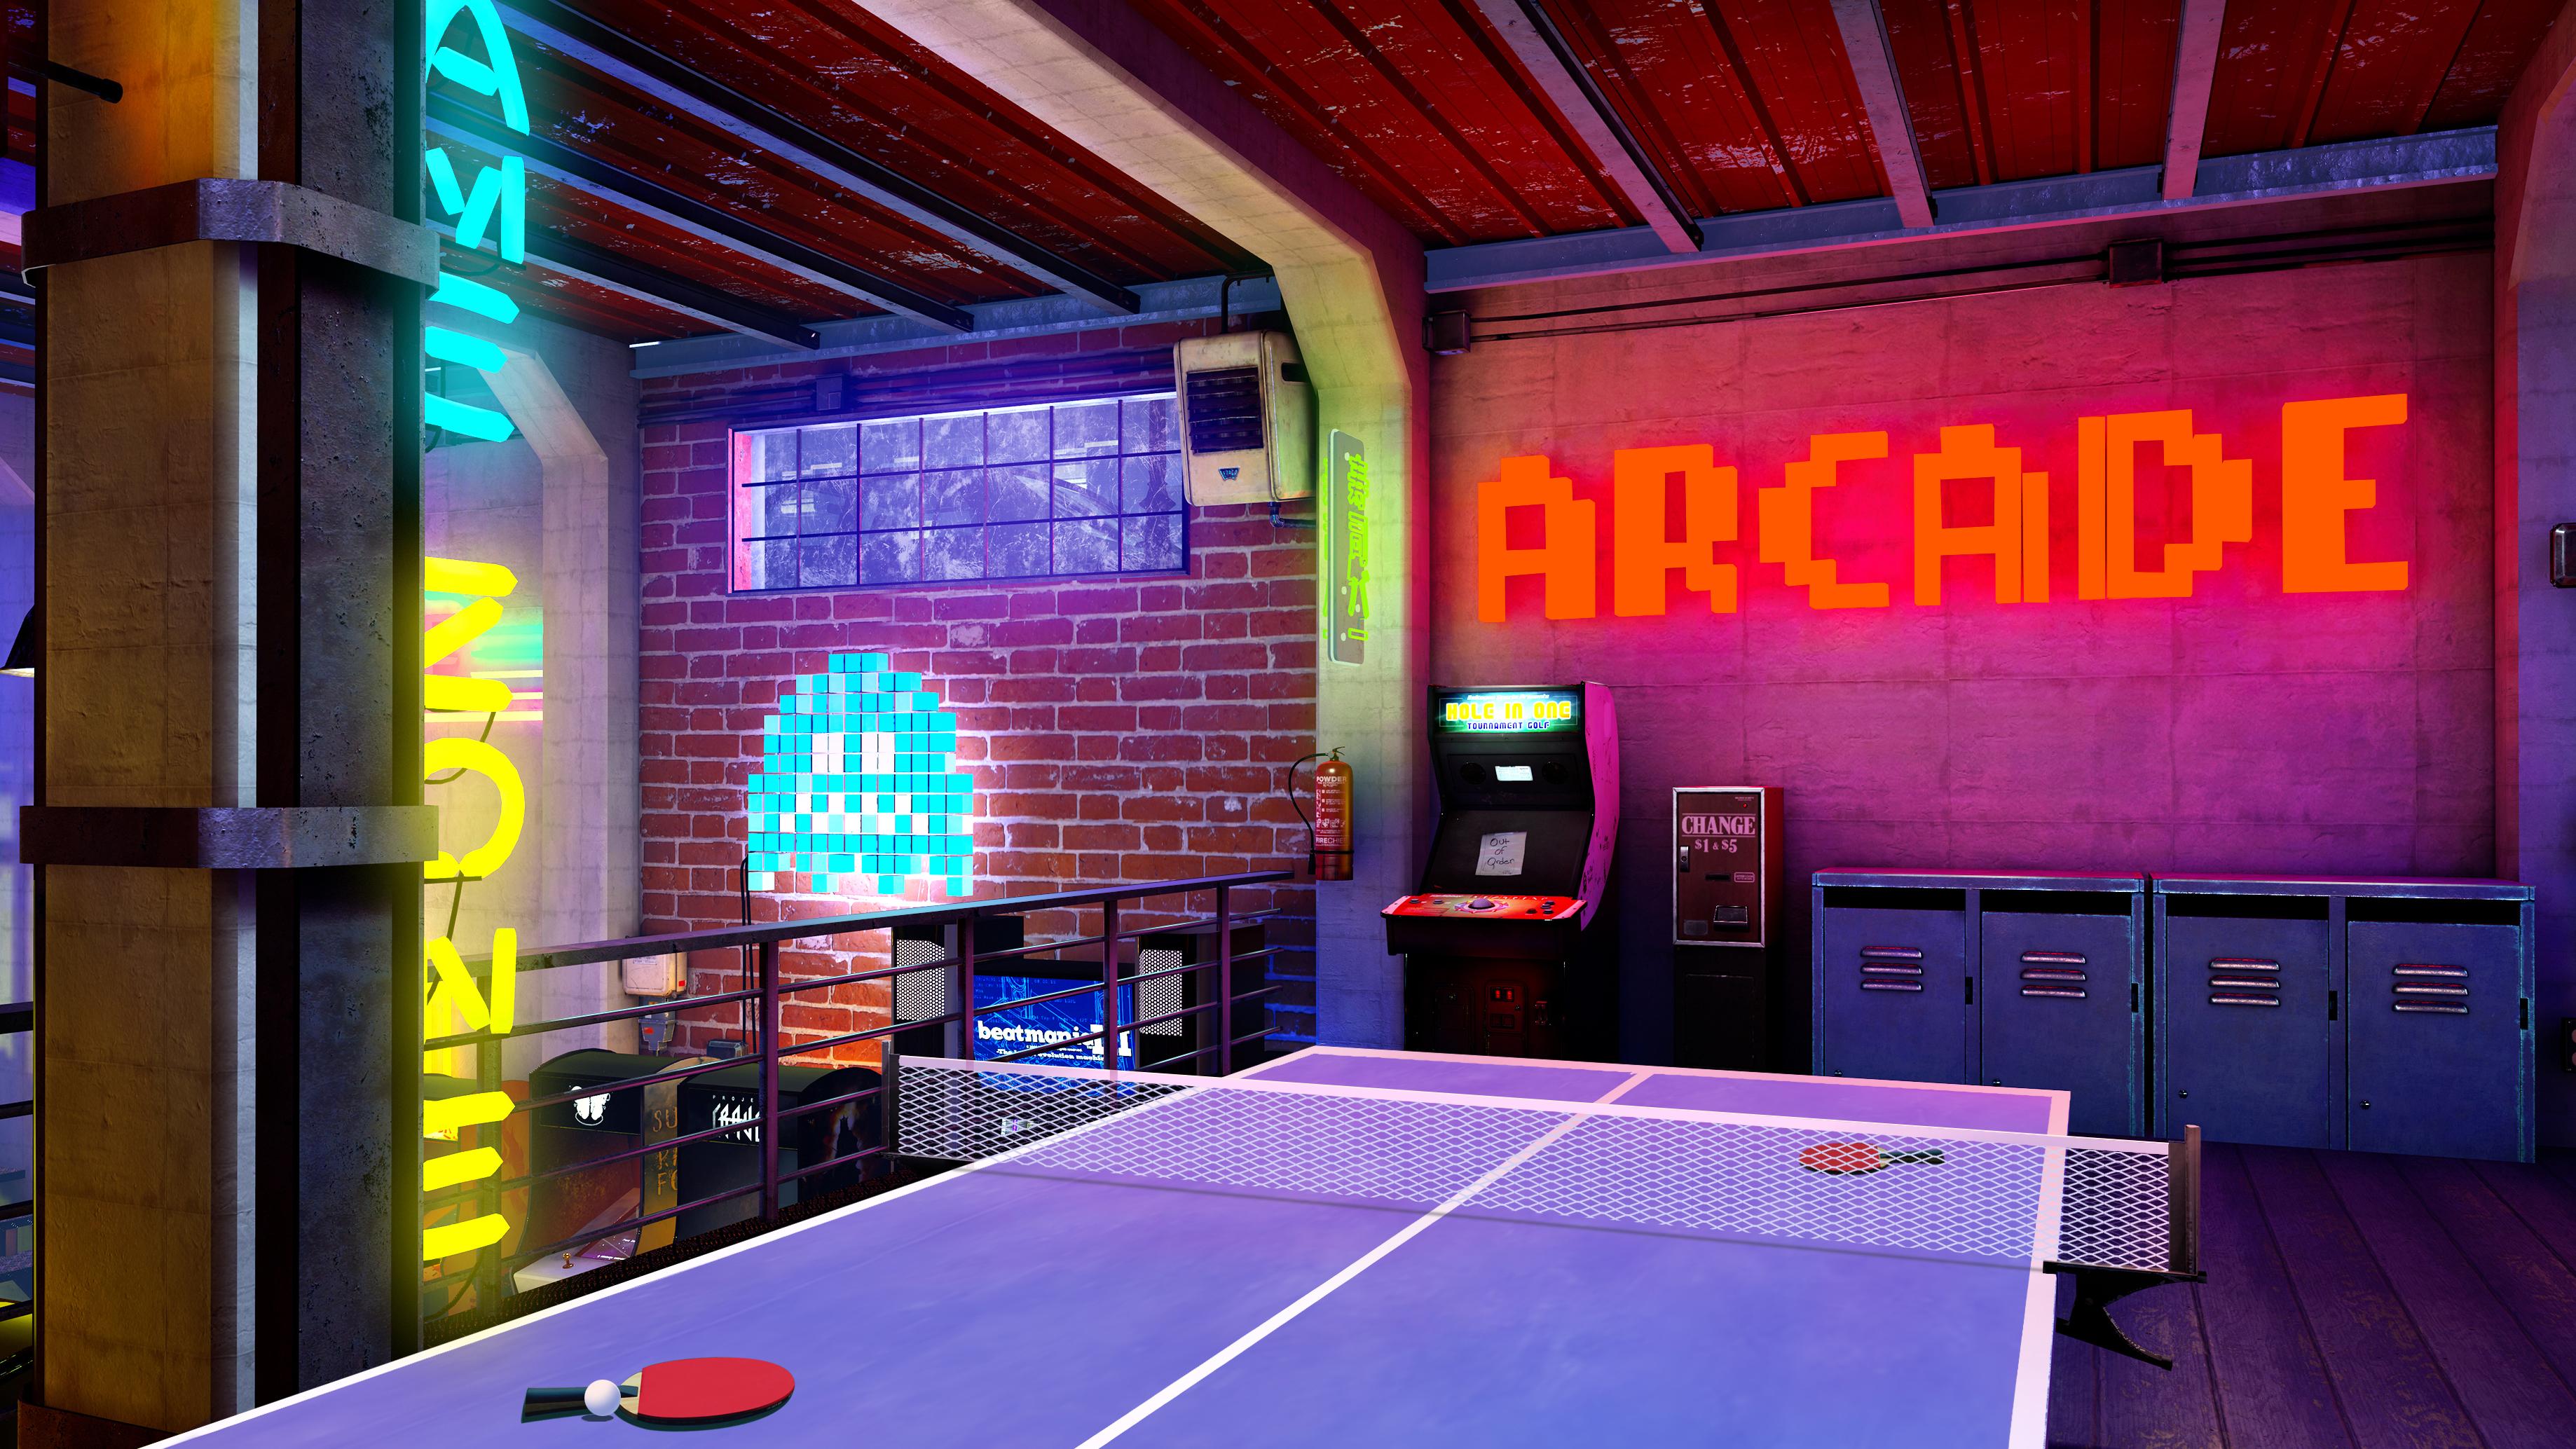 https://www.gamerome.com/wp-content/uploads/2019/10/vr_ping_pong.jpg